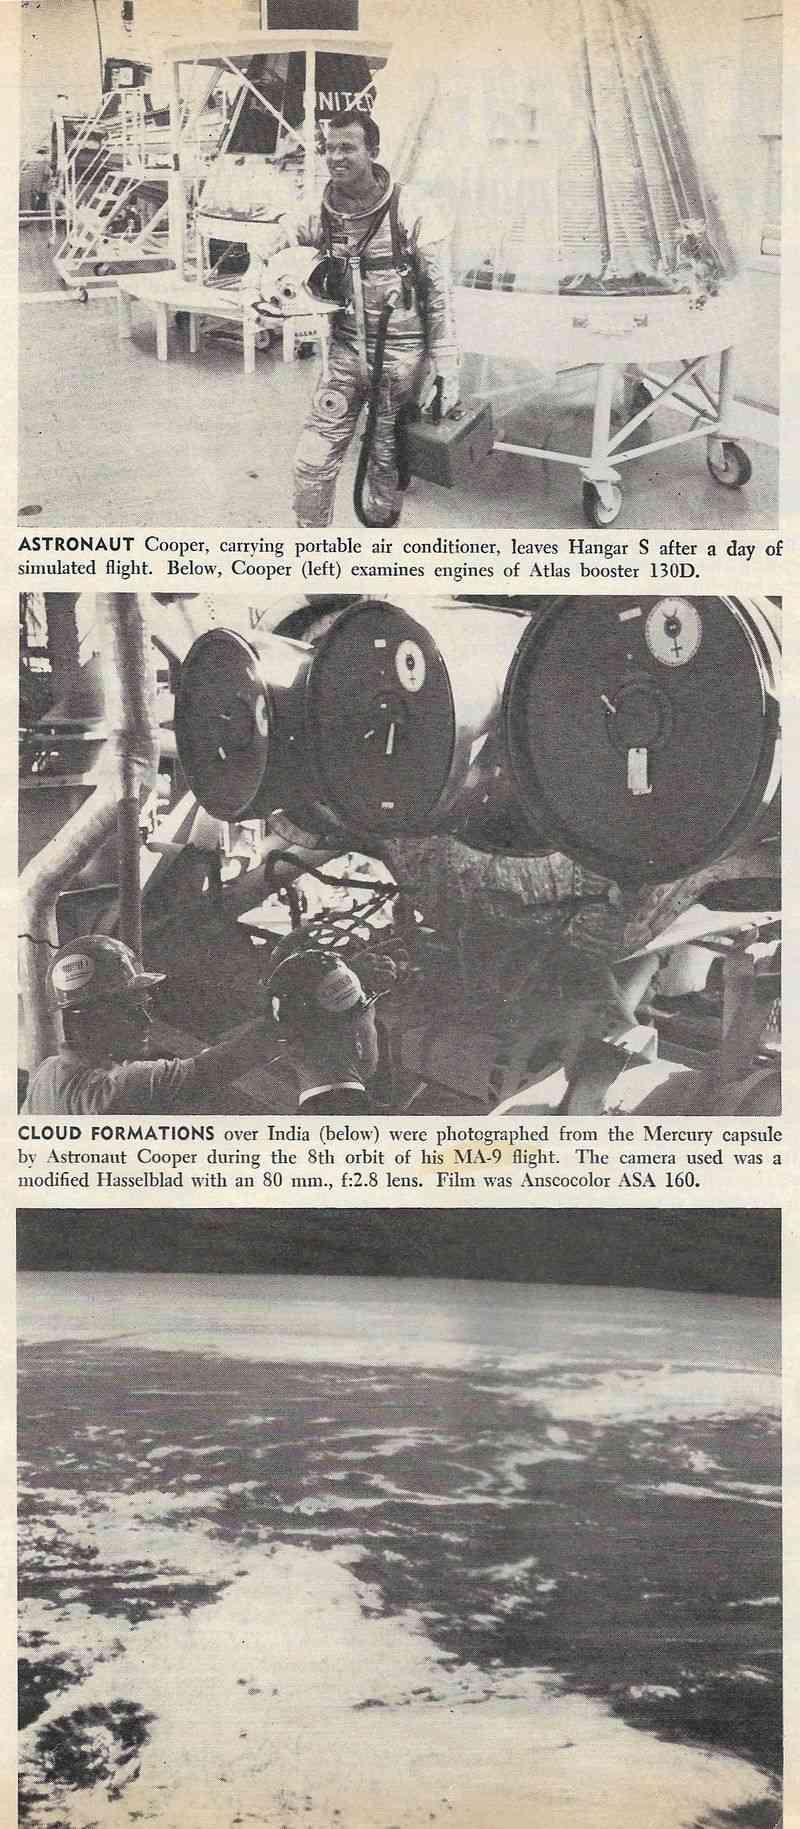 15 mai 1963 - Mercury Atlas  3 - Gordon Cooper 63072210